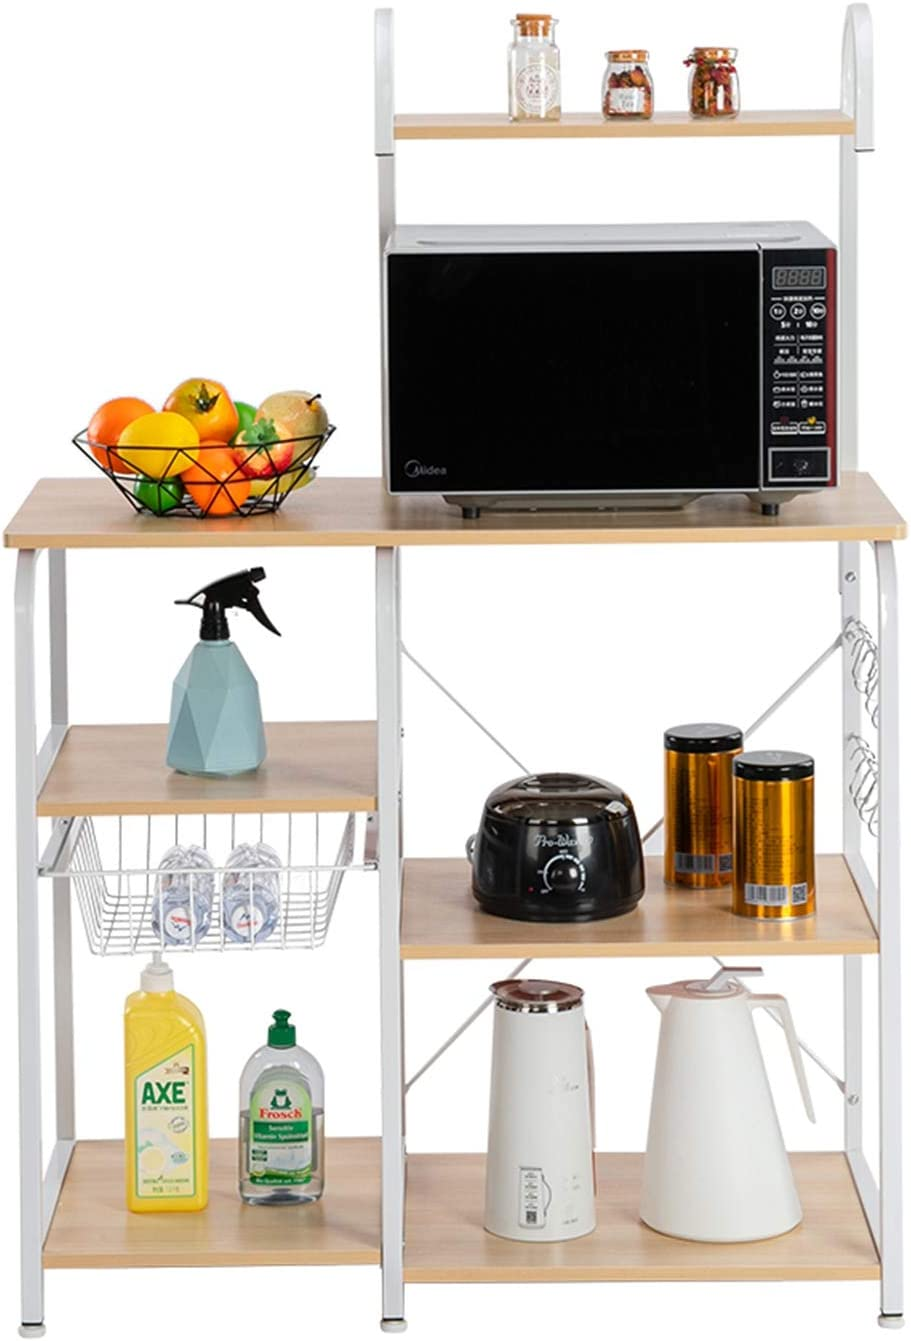 Kitchen Standing Baker's Rack 35.5 St Inch Over item handling ☆ Ranking TOP2 Microwave Industrial